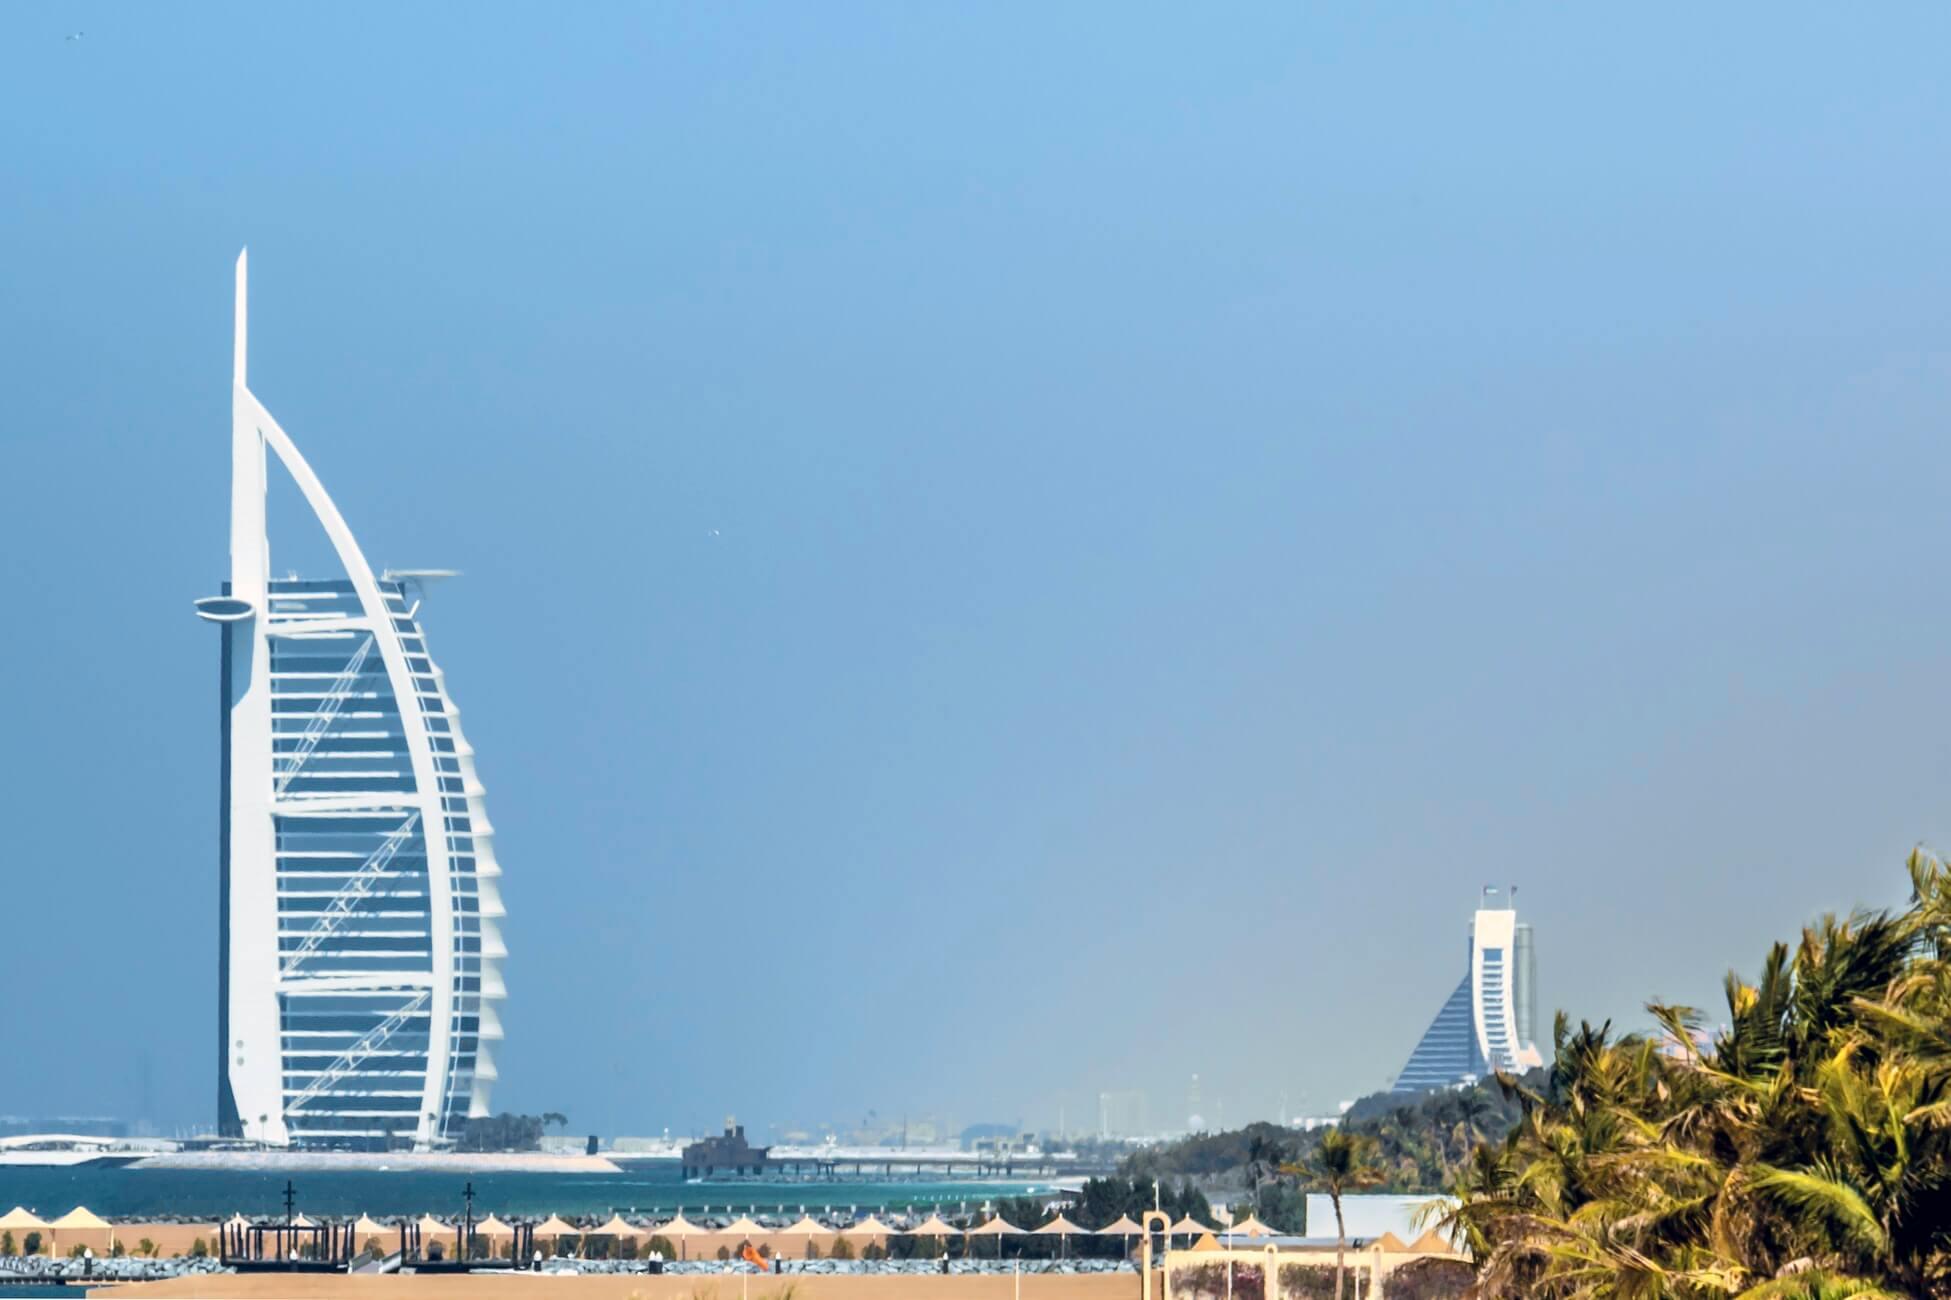 Burj al Arab Hotel beach view